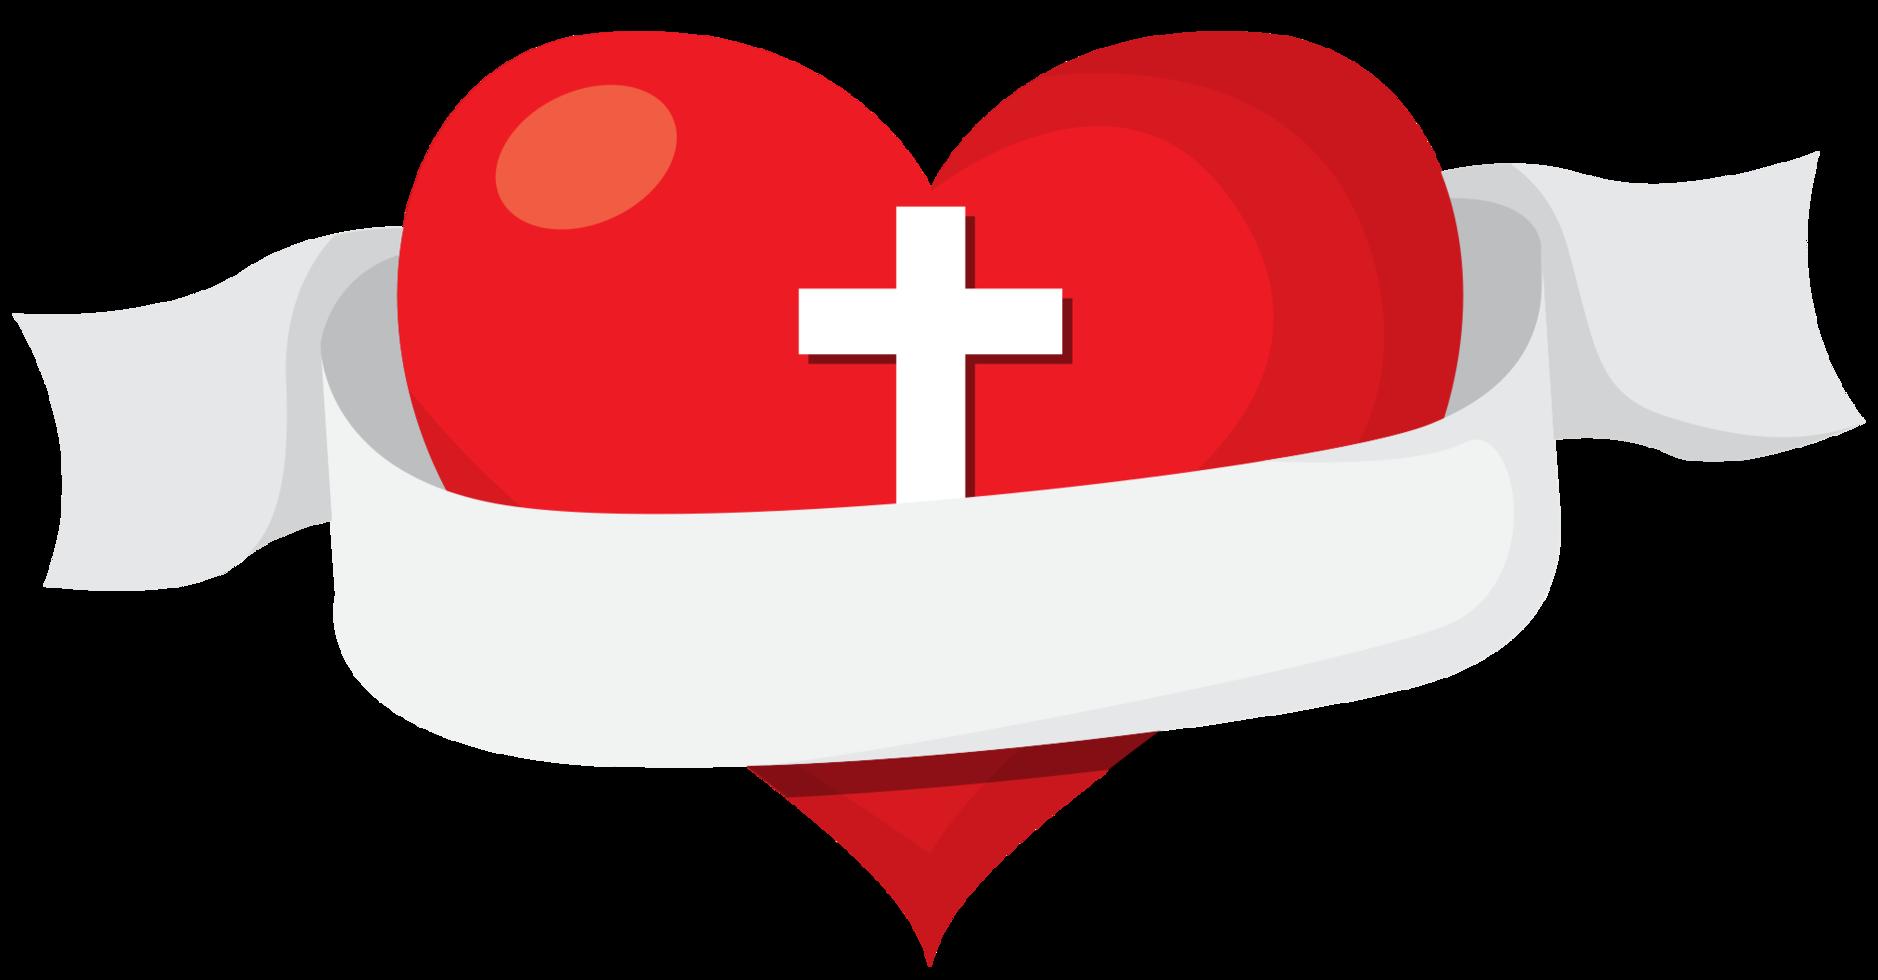 Sacred heart banner png